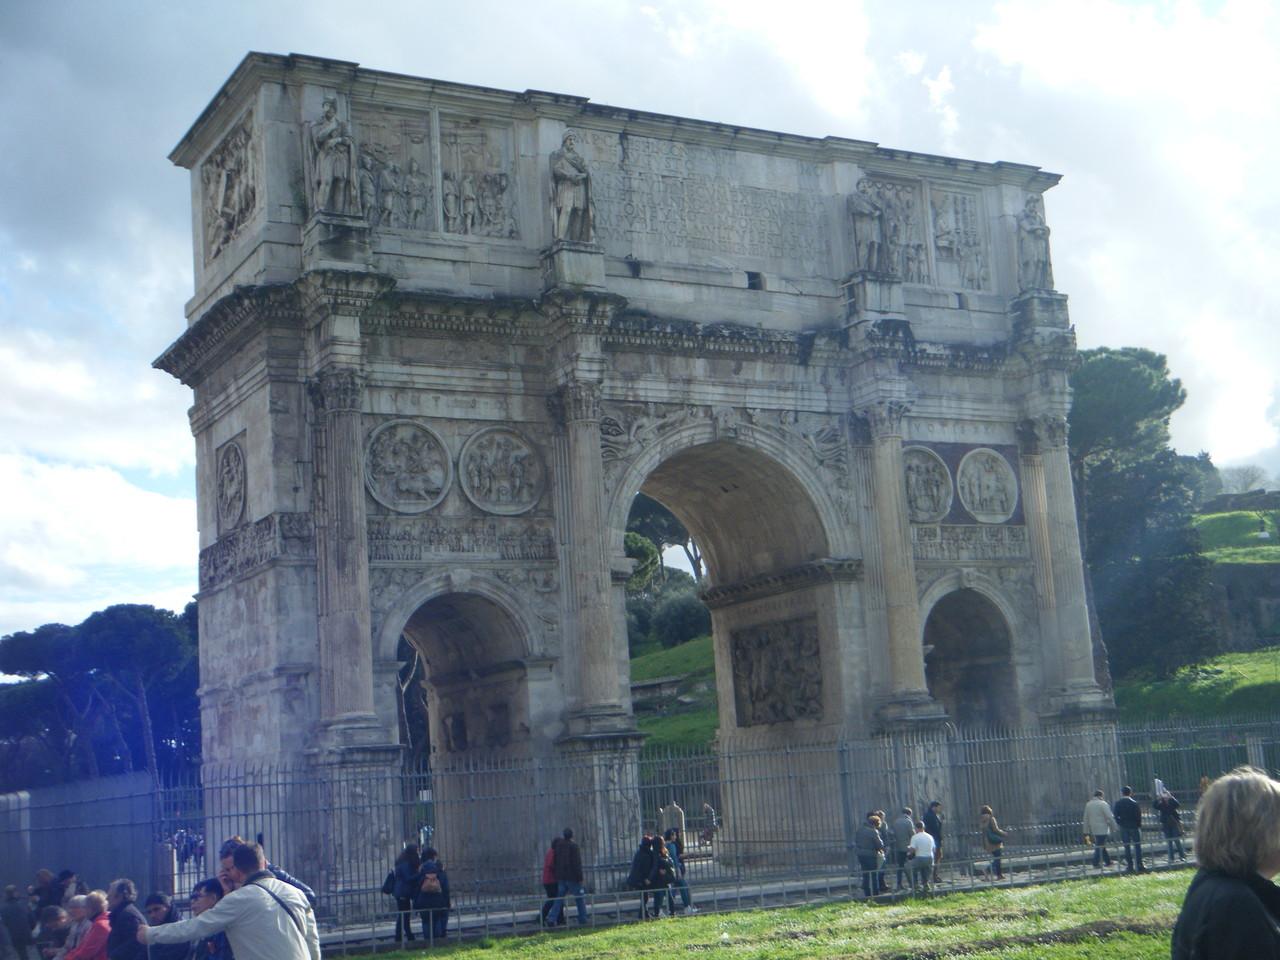 Arche de Constantin